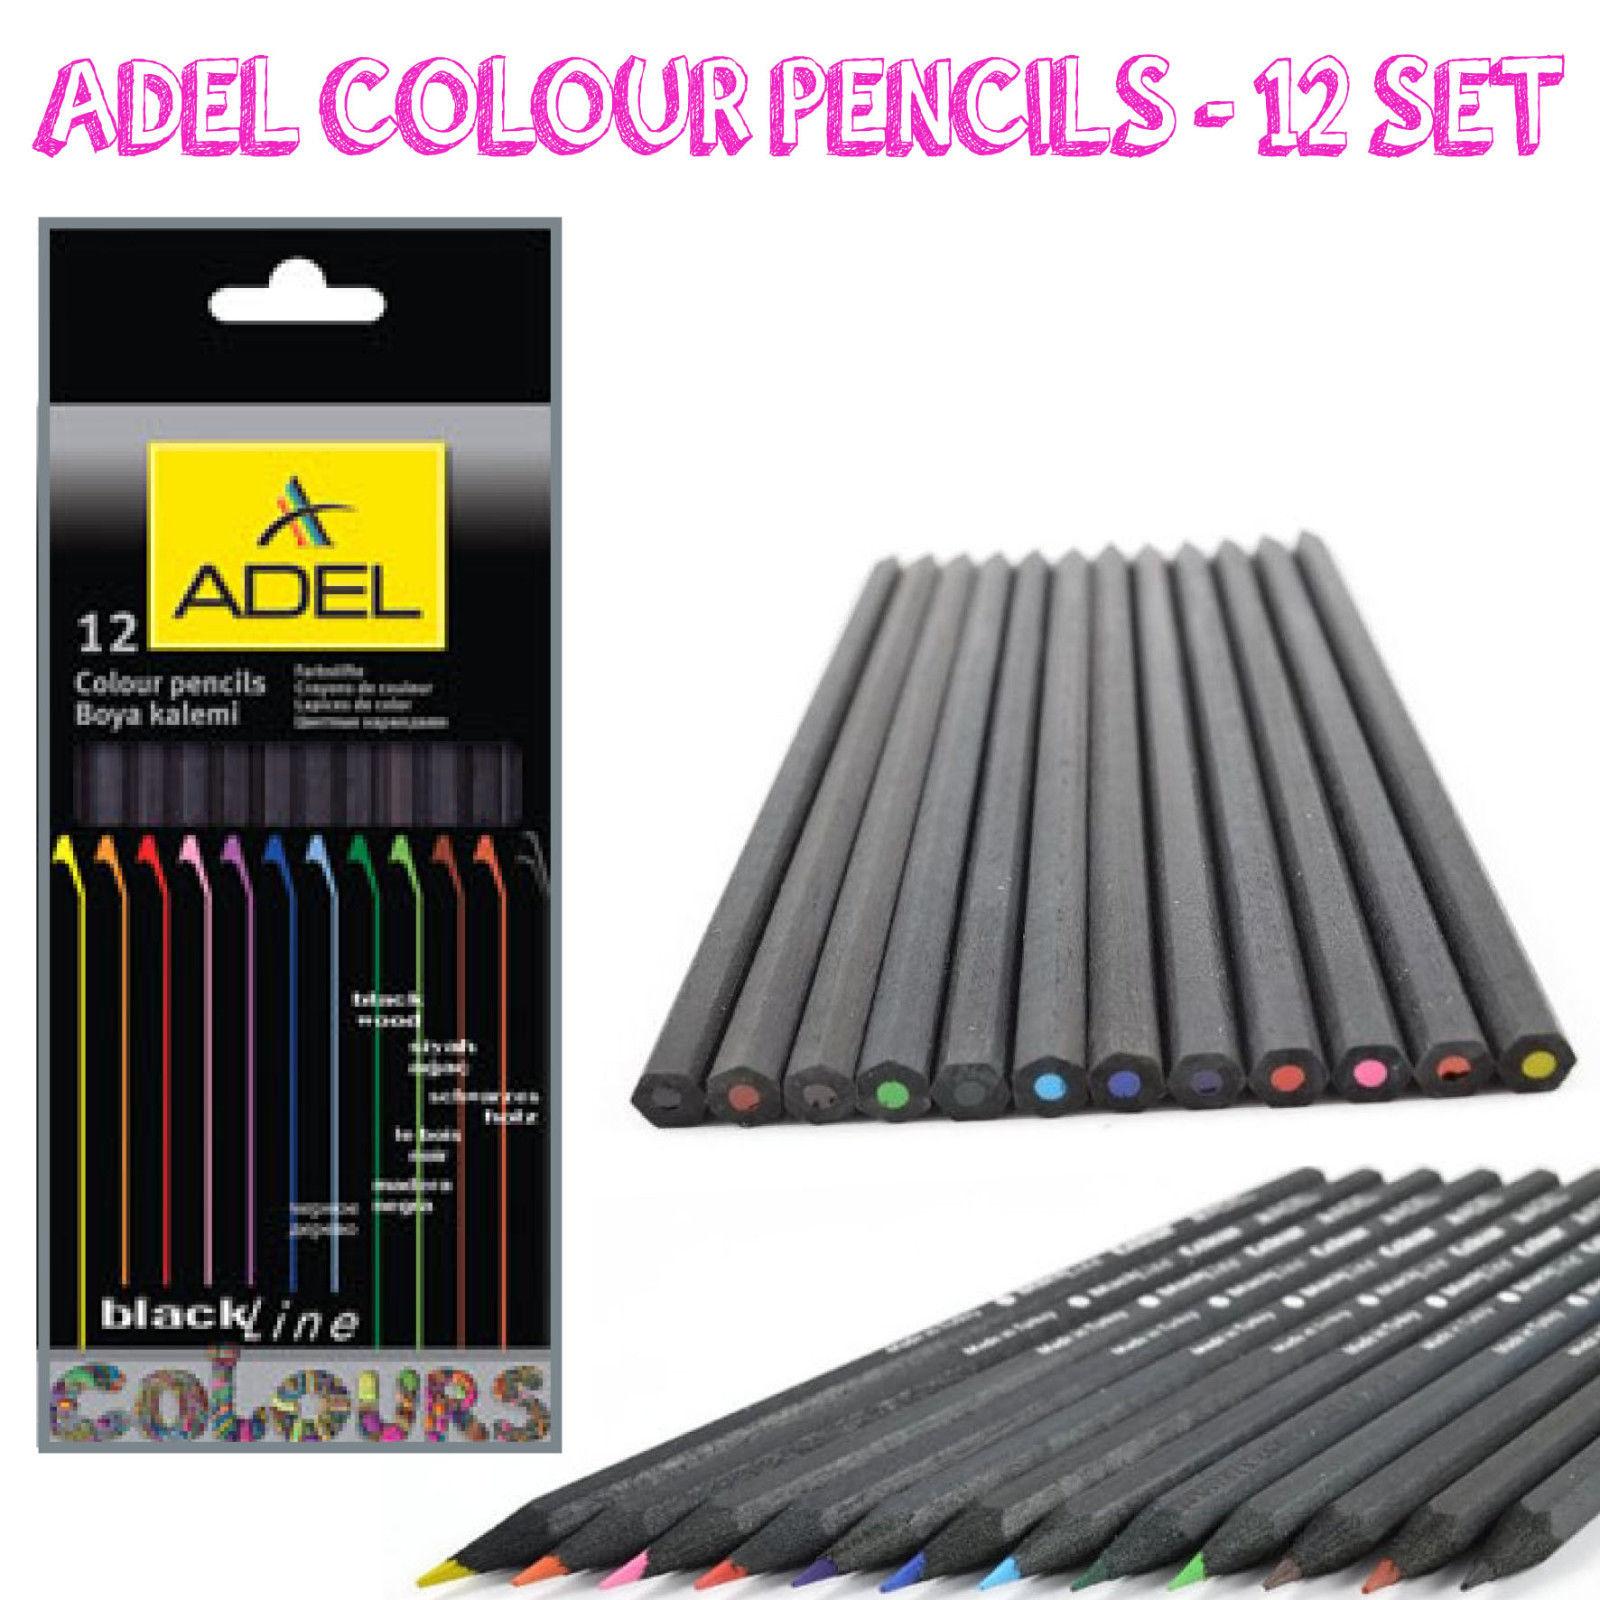 Adel Coloured Pencils set of 12